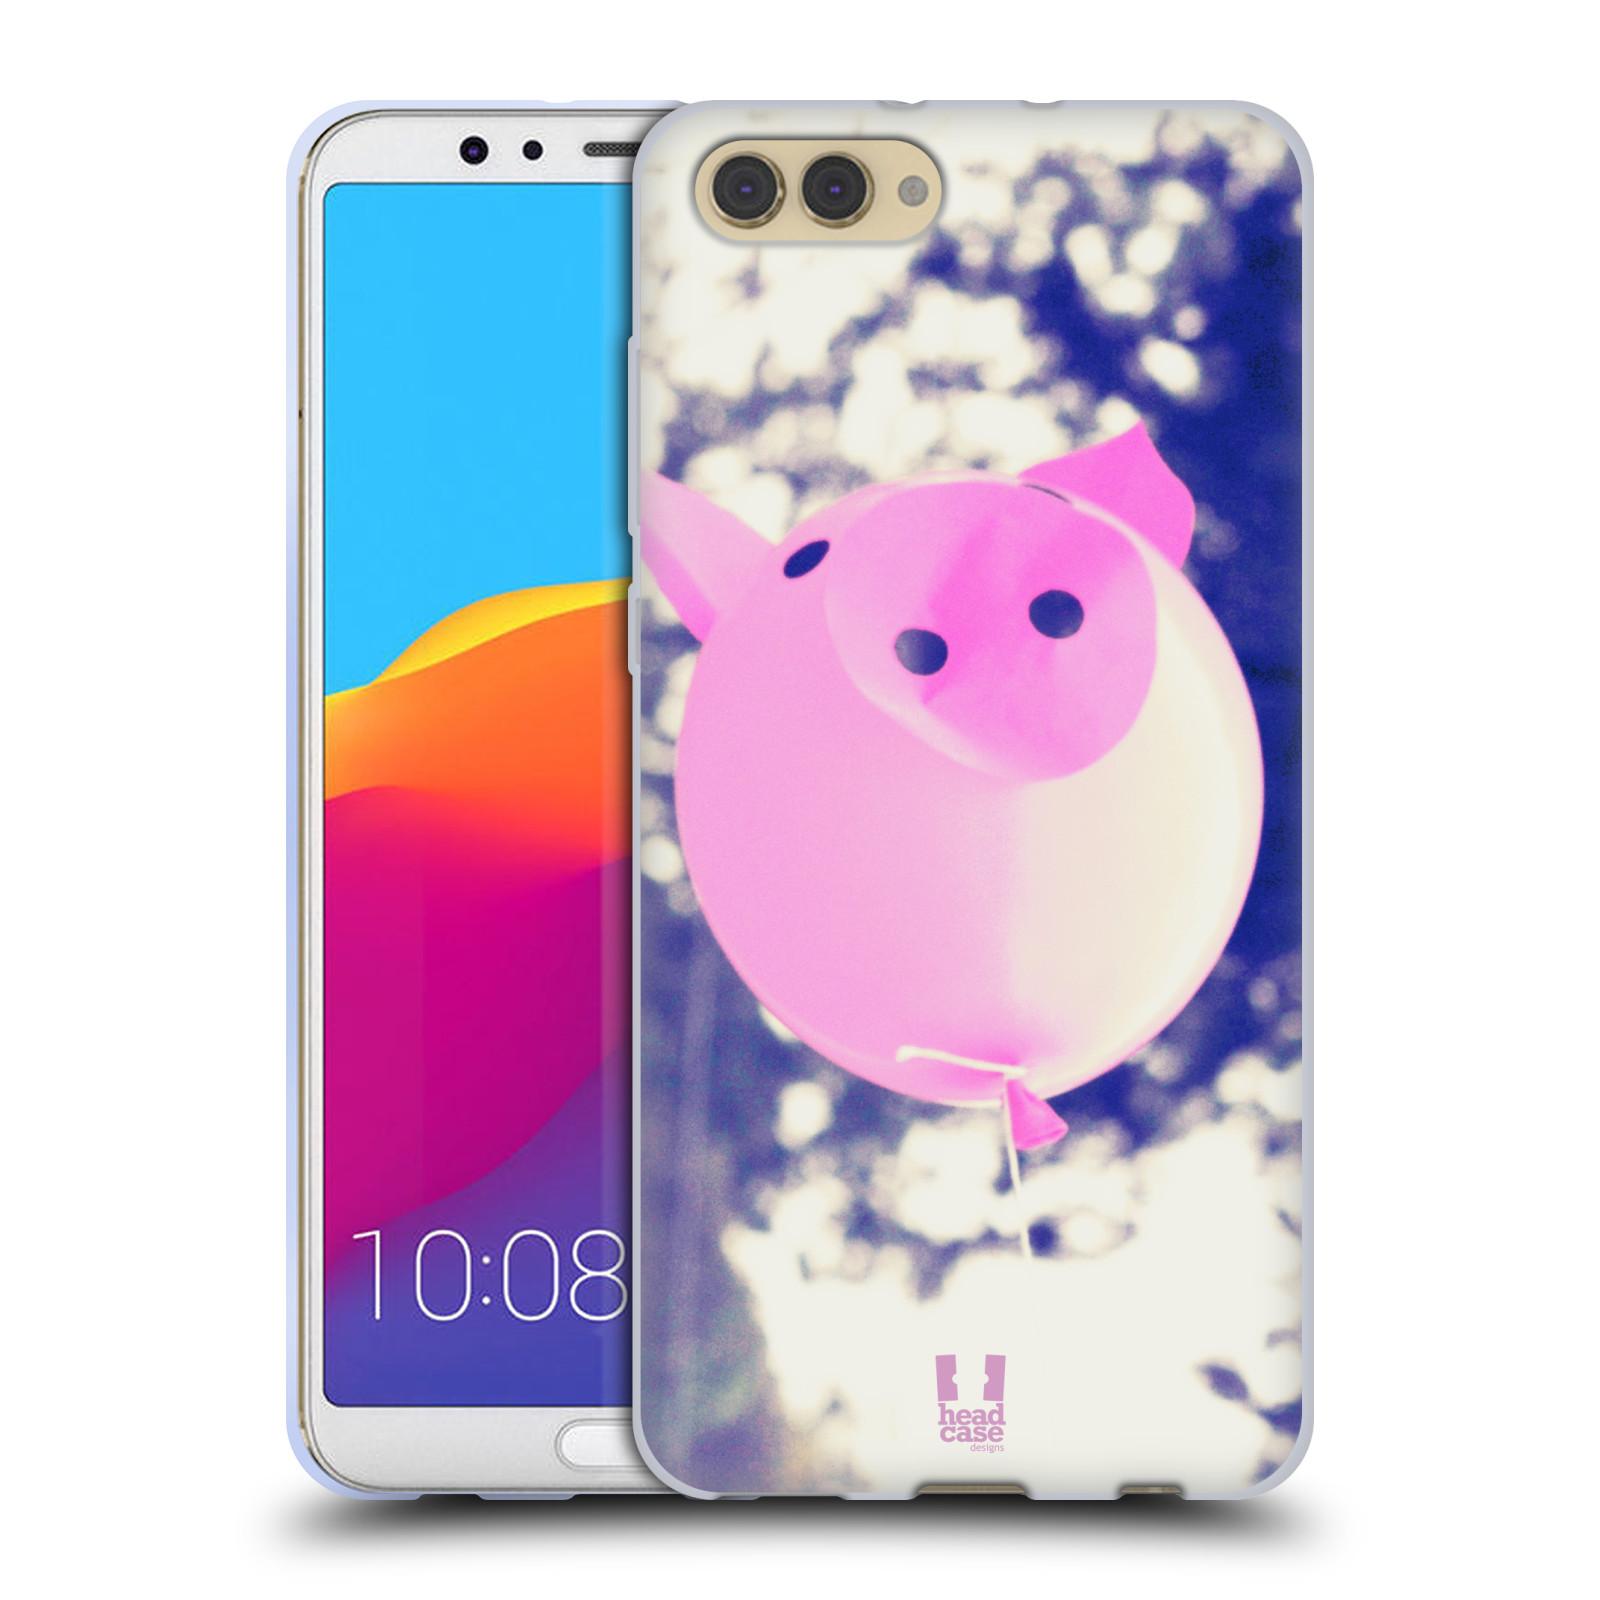 Silikonové pouzdro na mobil Honor View 10 - Head Case - BALON PAŠÍK